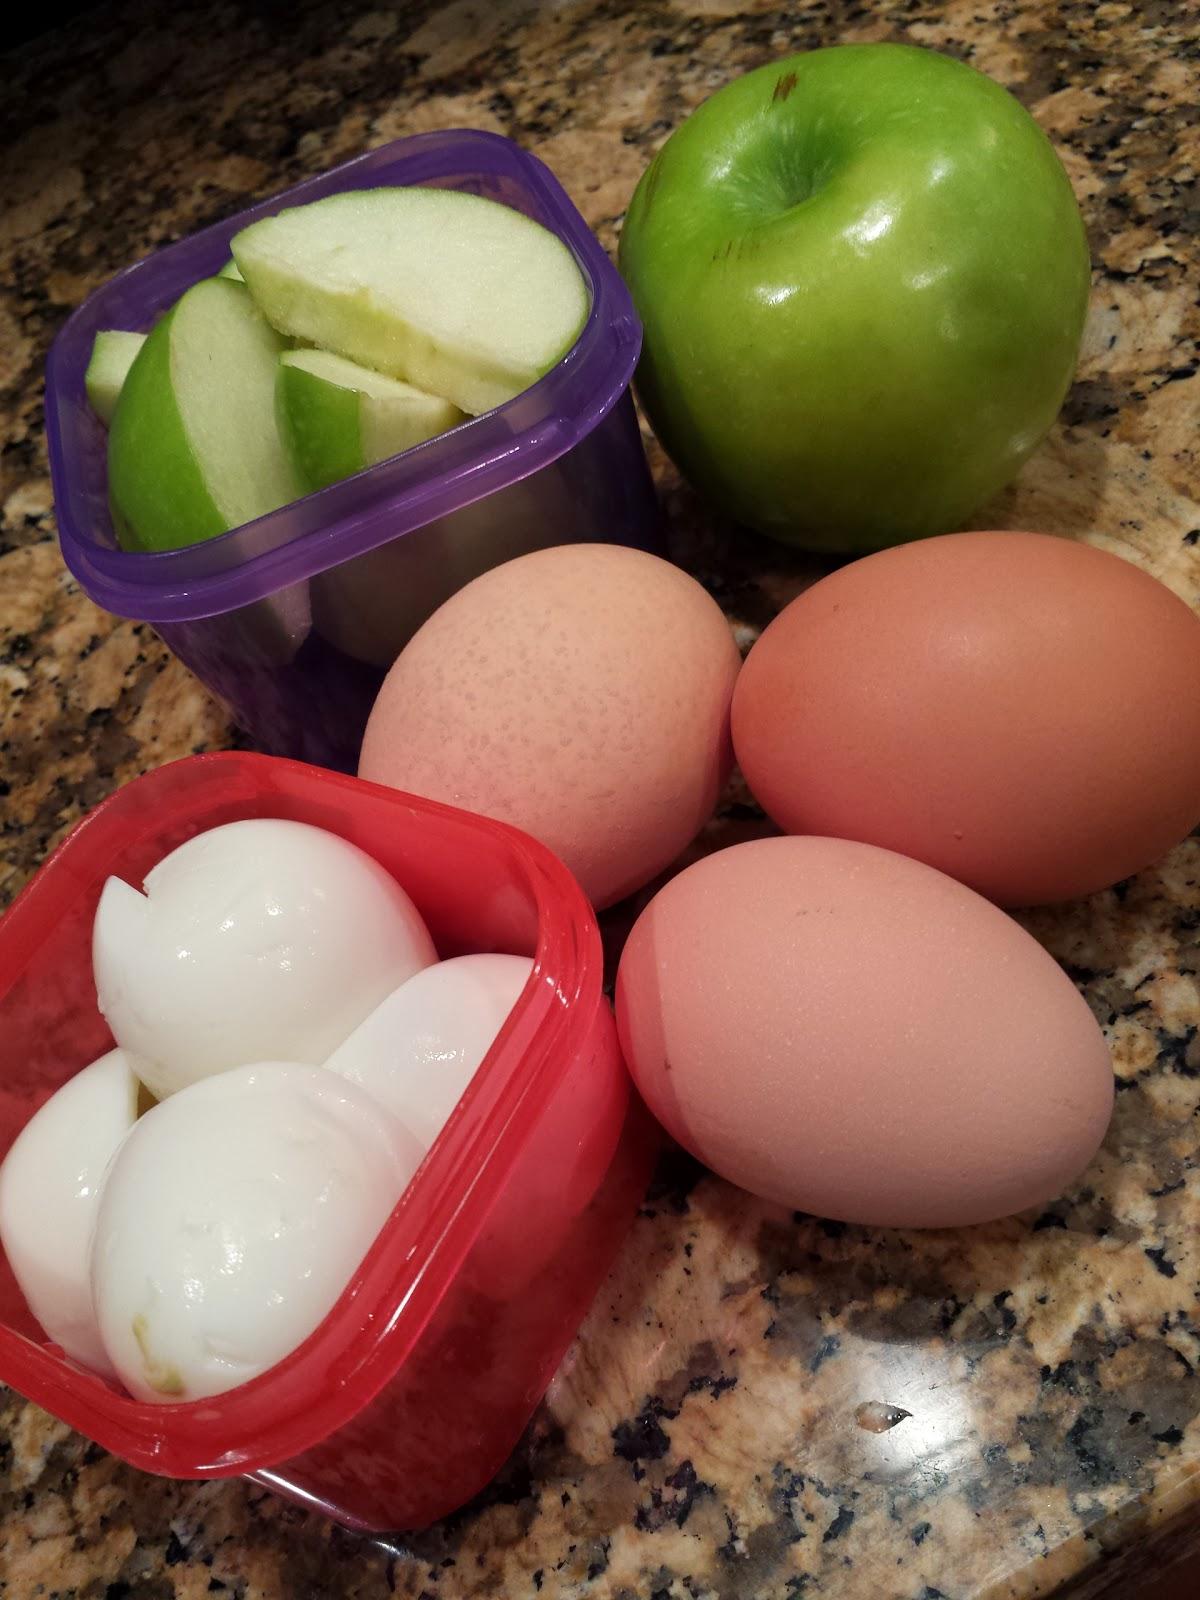 Size 0 Diet Exercise Plan: Deidra Penrose: 21 DAY FIX- WEEK 1 Meal/Exercise Plan